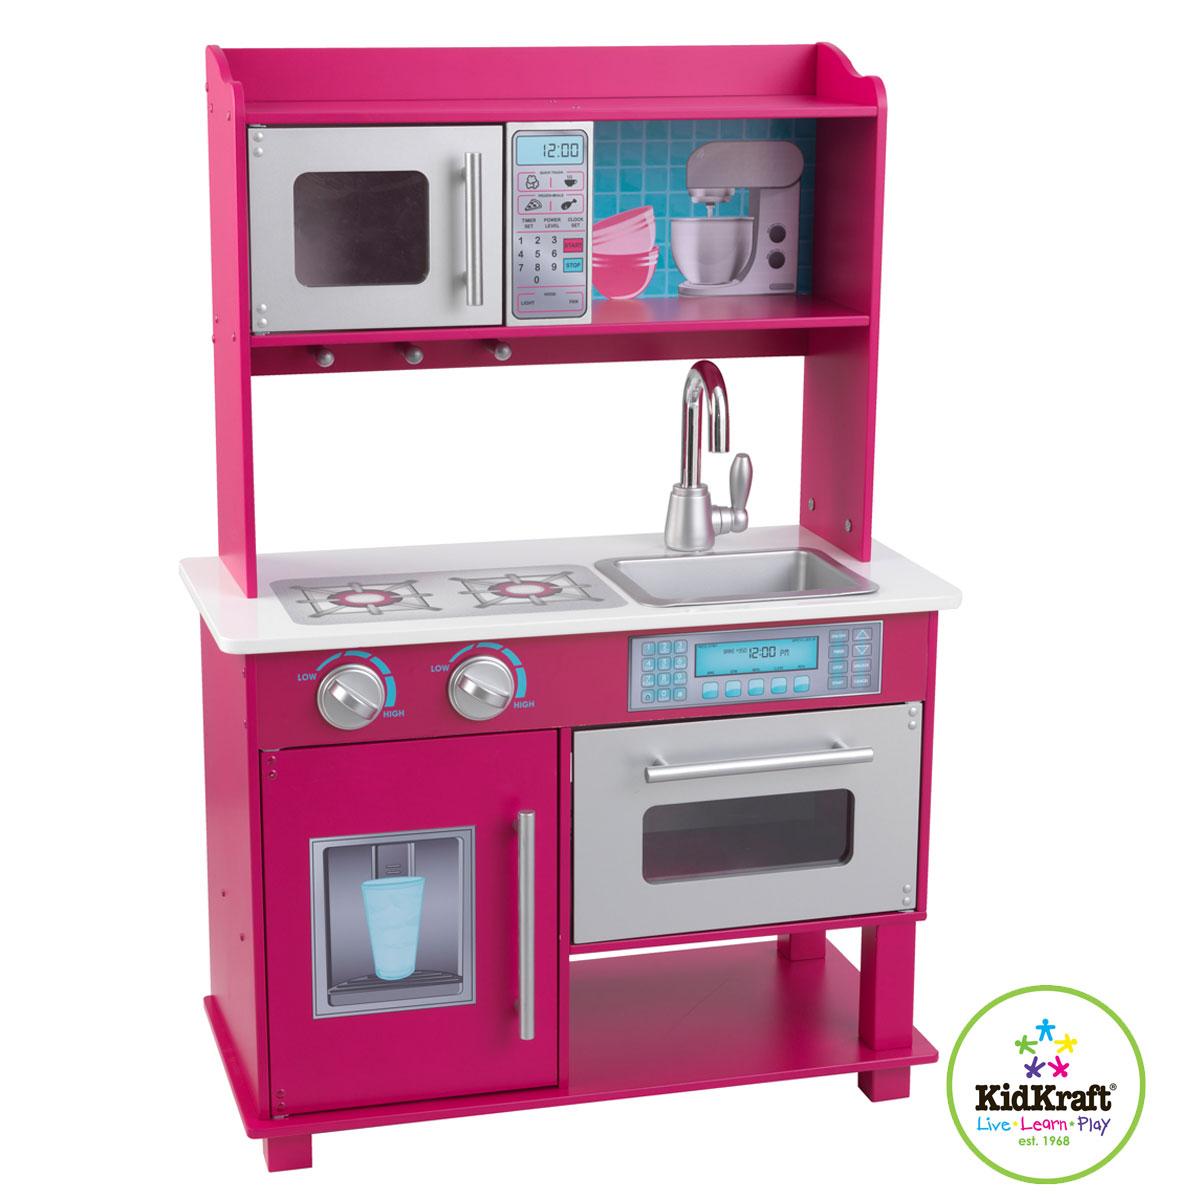 Kidkraft kuchnia dla dzieci gracie 53277 for Cuisine en bois kidkraft